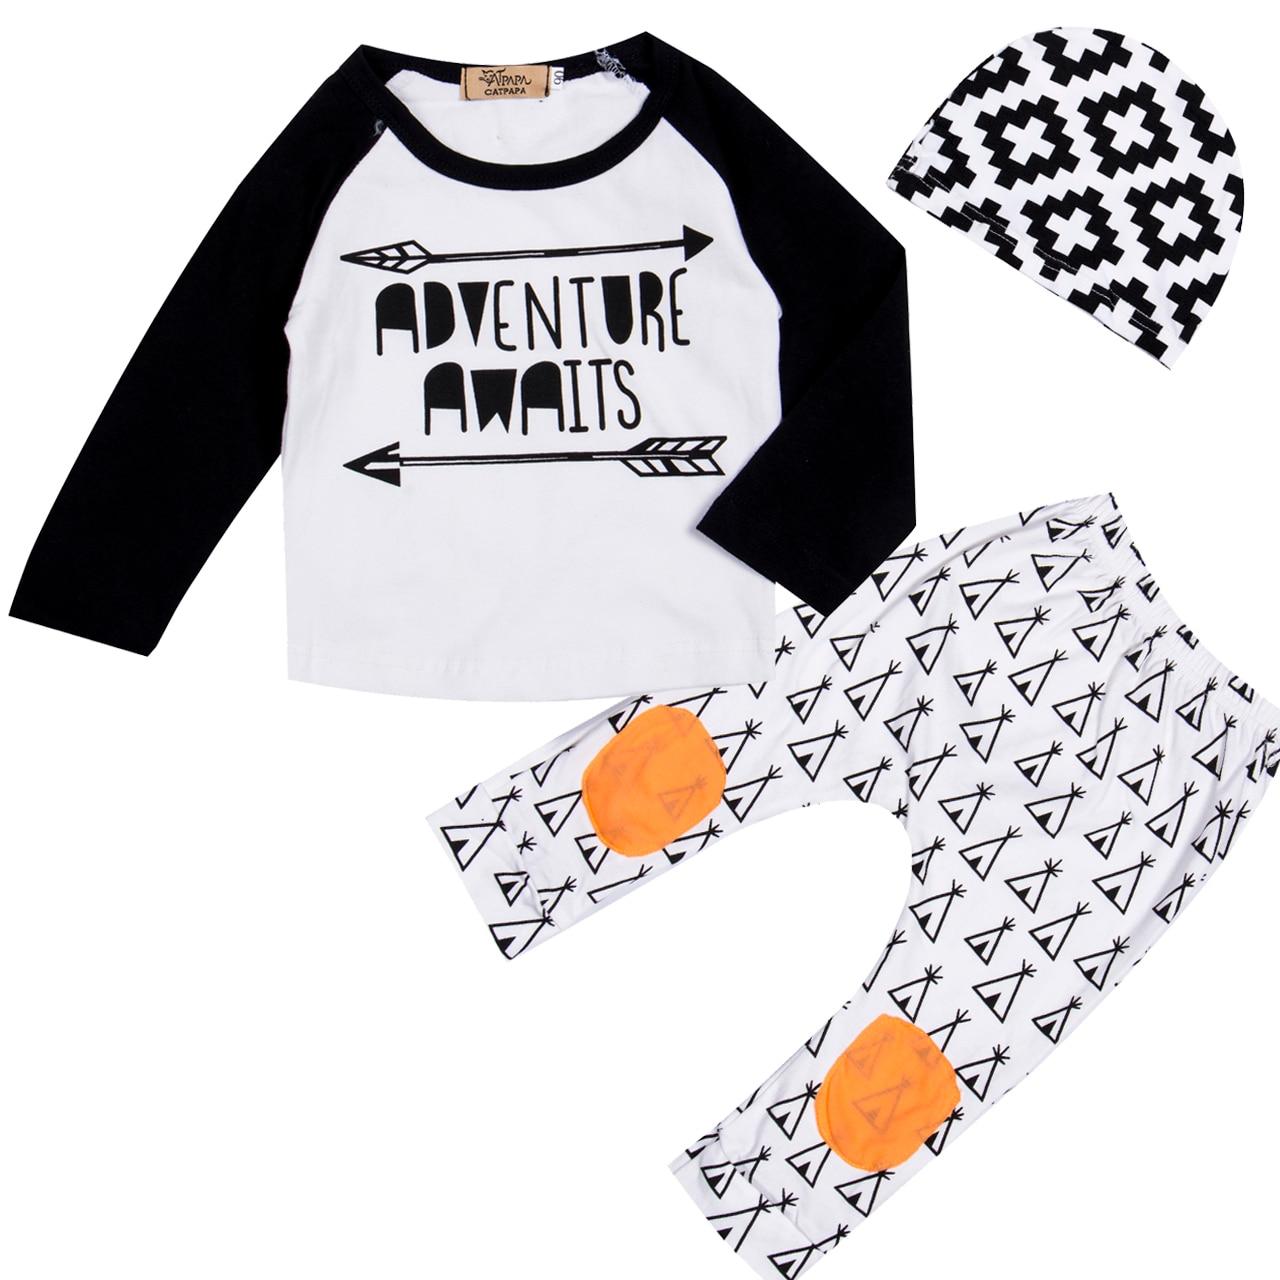 3 Pcs Newborn Kids Baby Girl Boy Letter Arrows Clothing Sets Infant Babies Long Sleeve Tops  sc 1 st  AliExpress.com & Online Get Cheap Kid Tent Set -Aliexpress.com   Alibaba Group